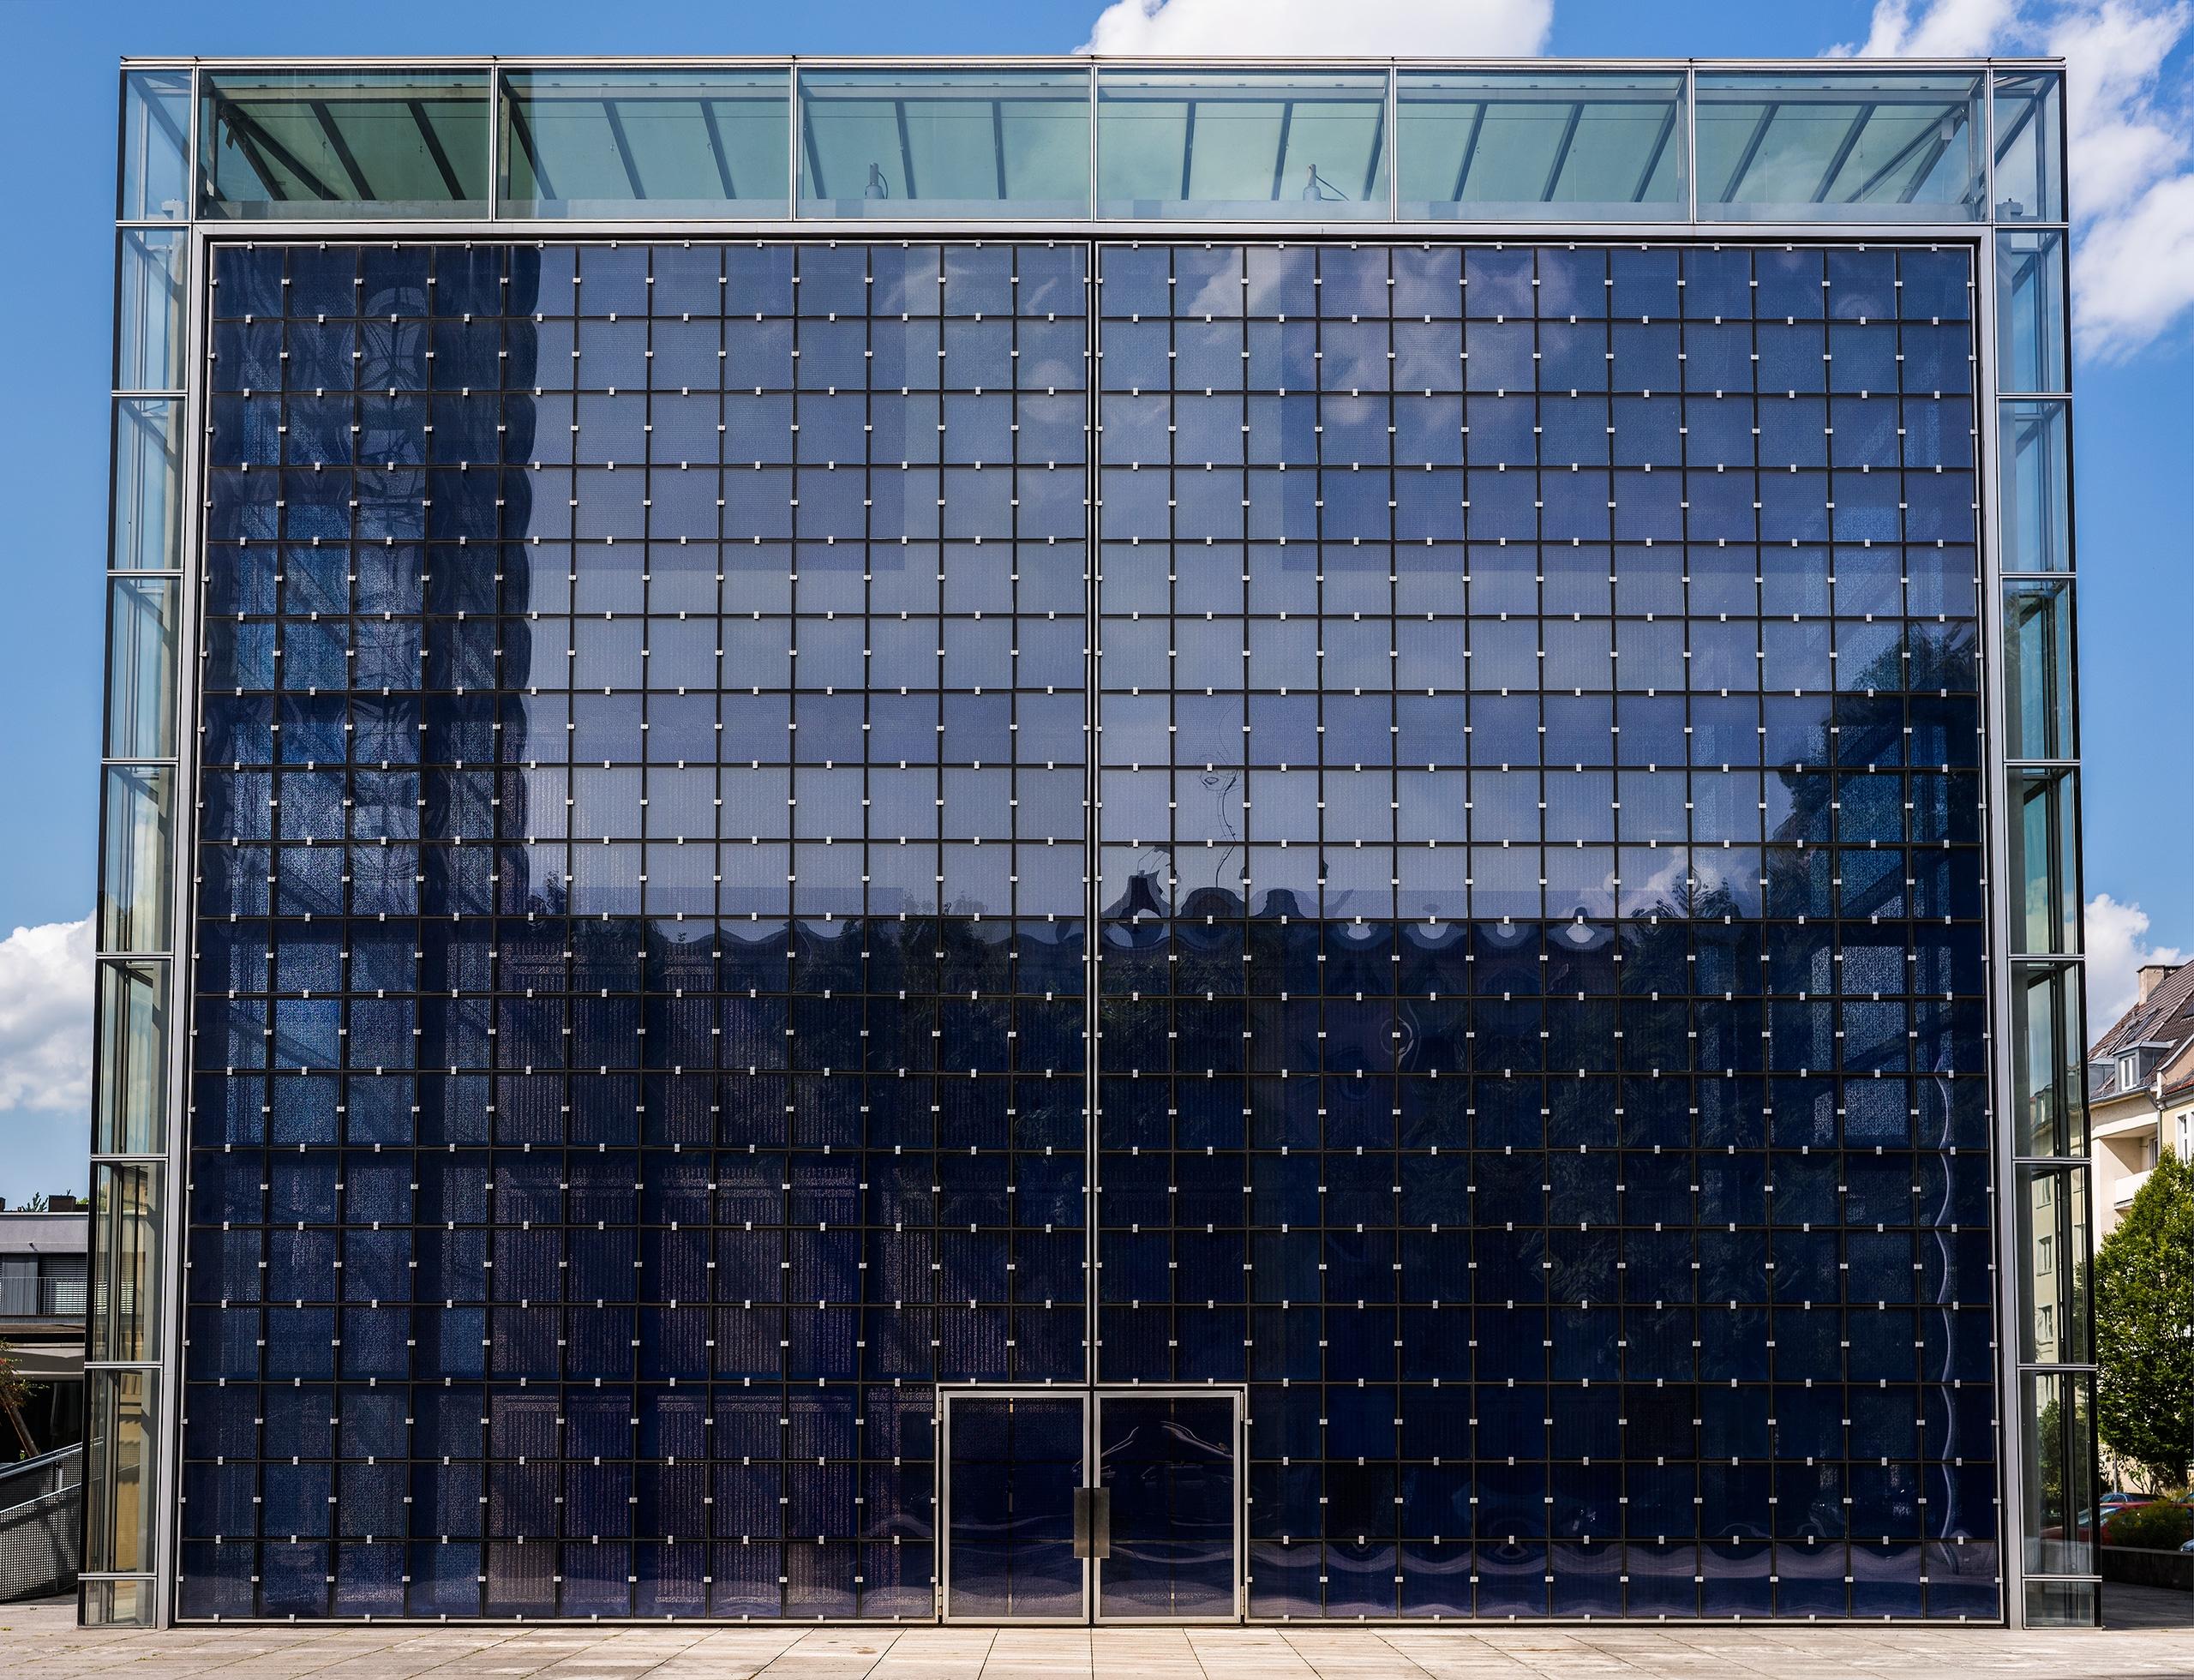 small doors giant - architecture - christofkessemeier   ello